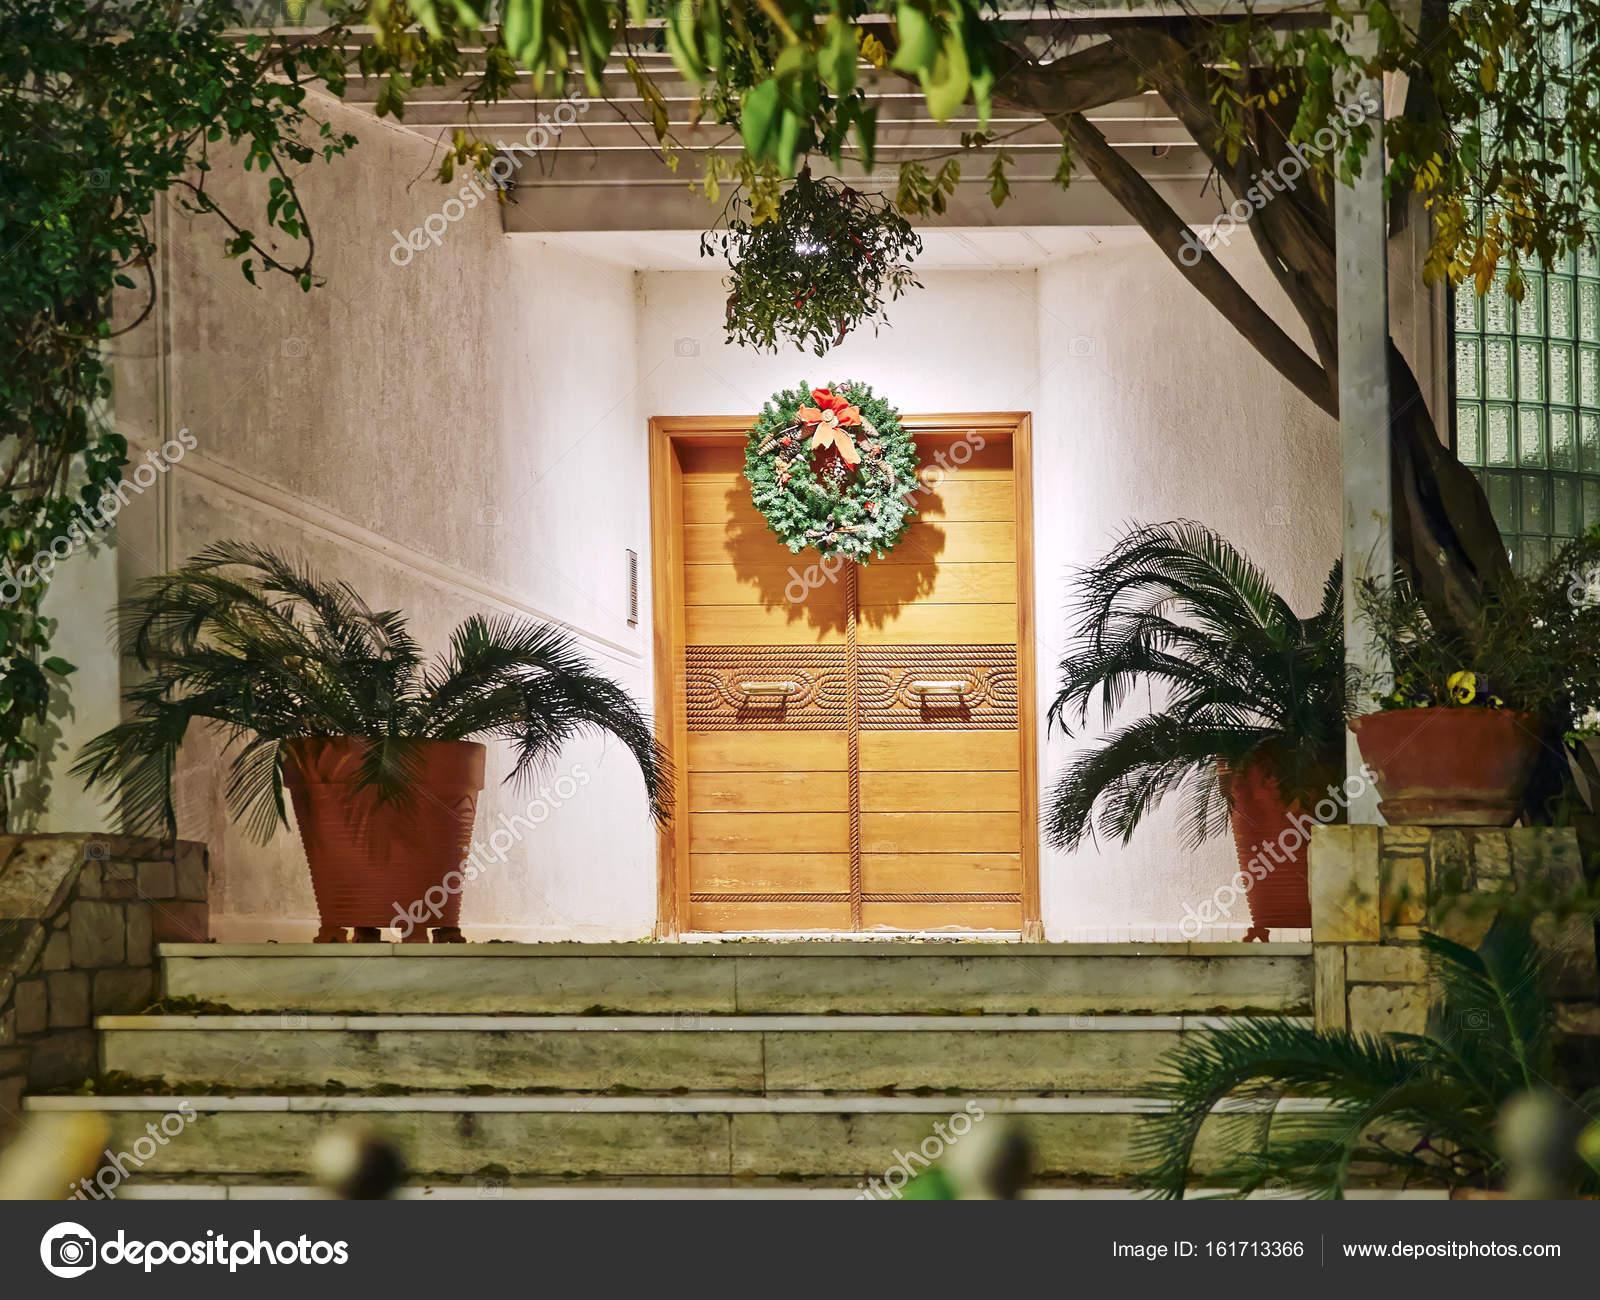 Huis ingang kerst nacht weergave u stockfoto dimitriosp